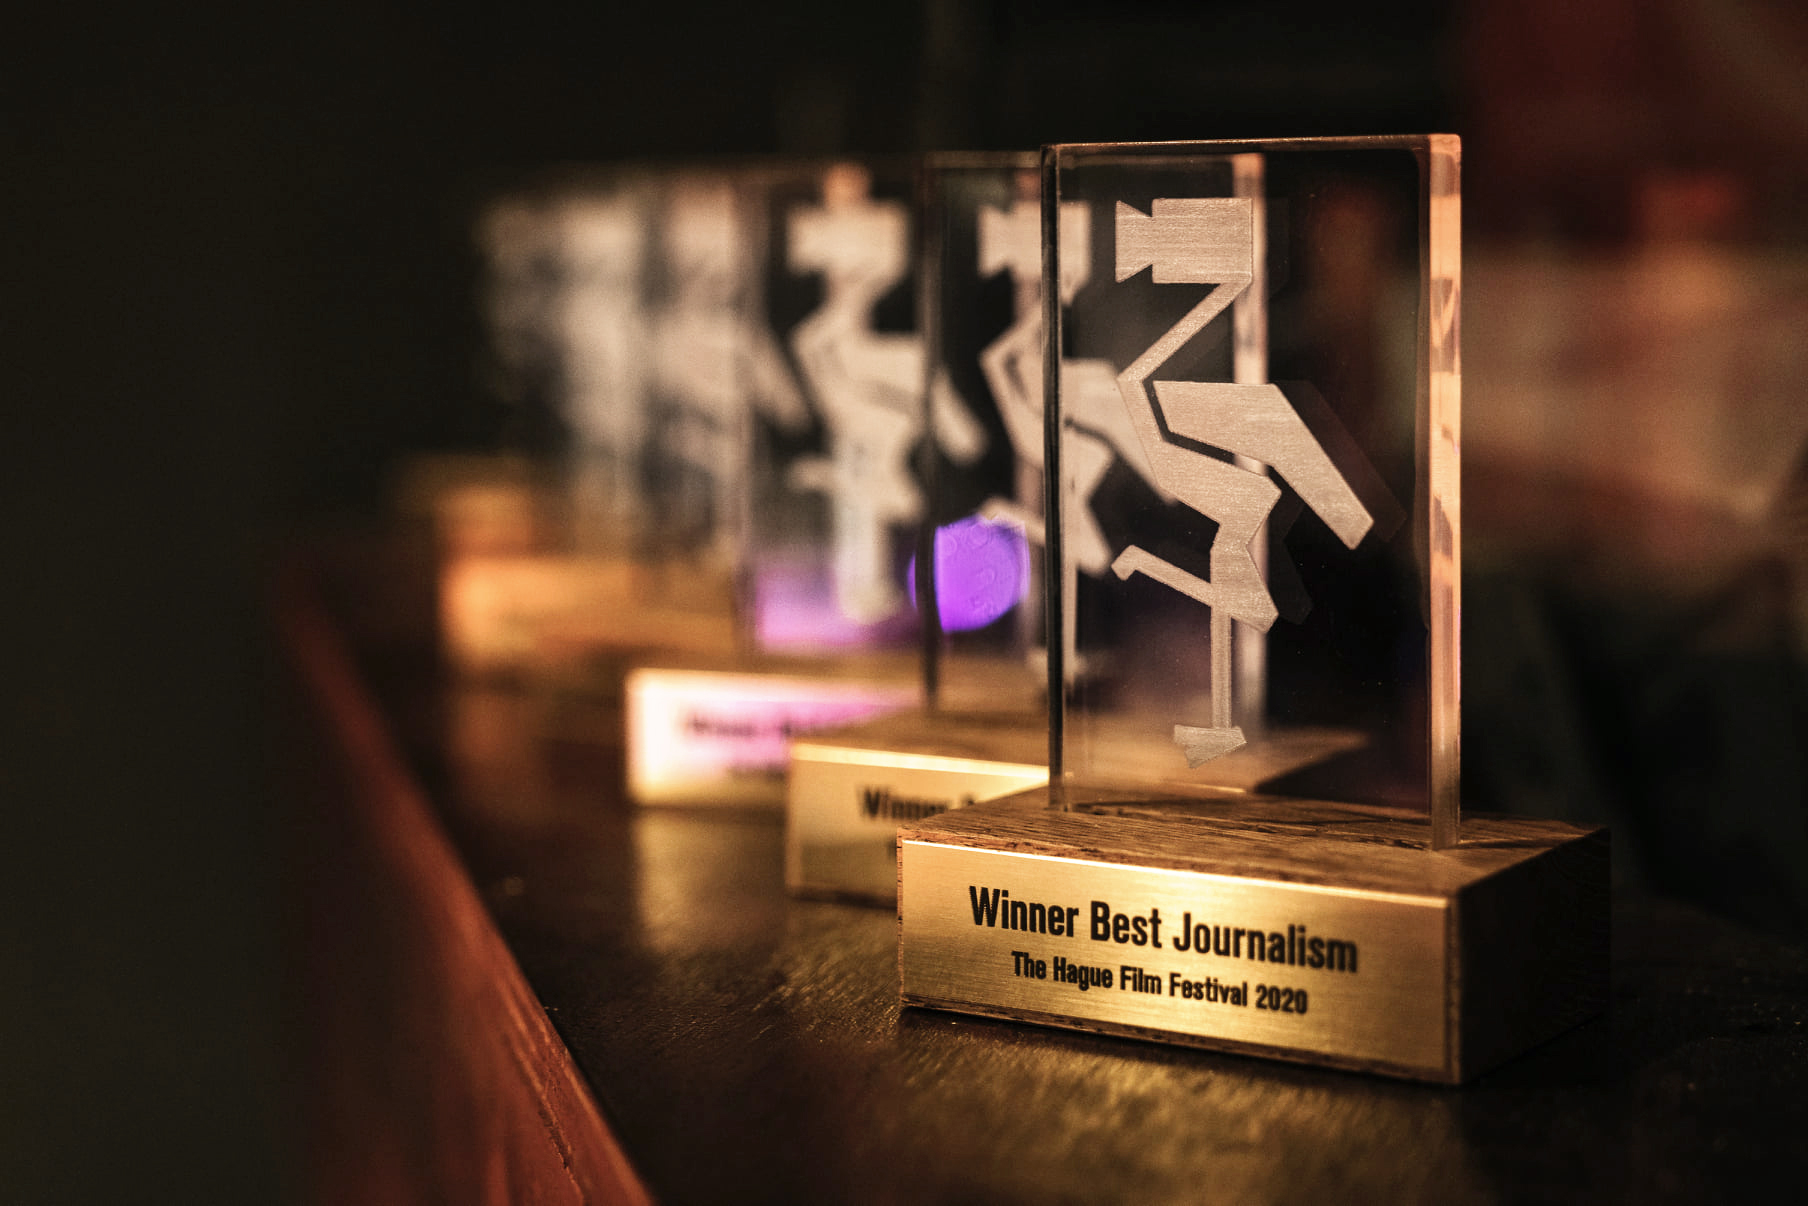 Work_and_dam-THFF-awards-01